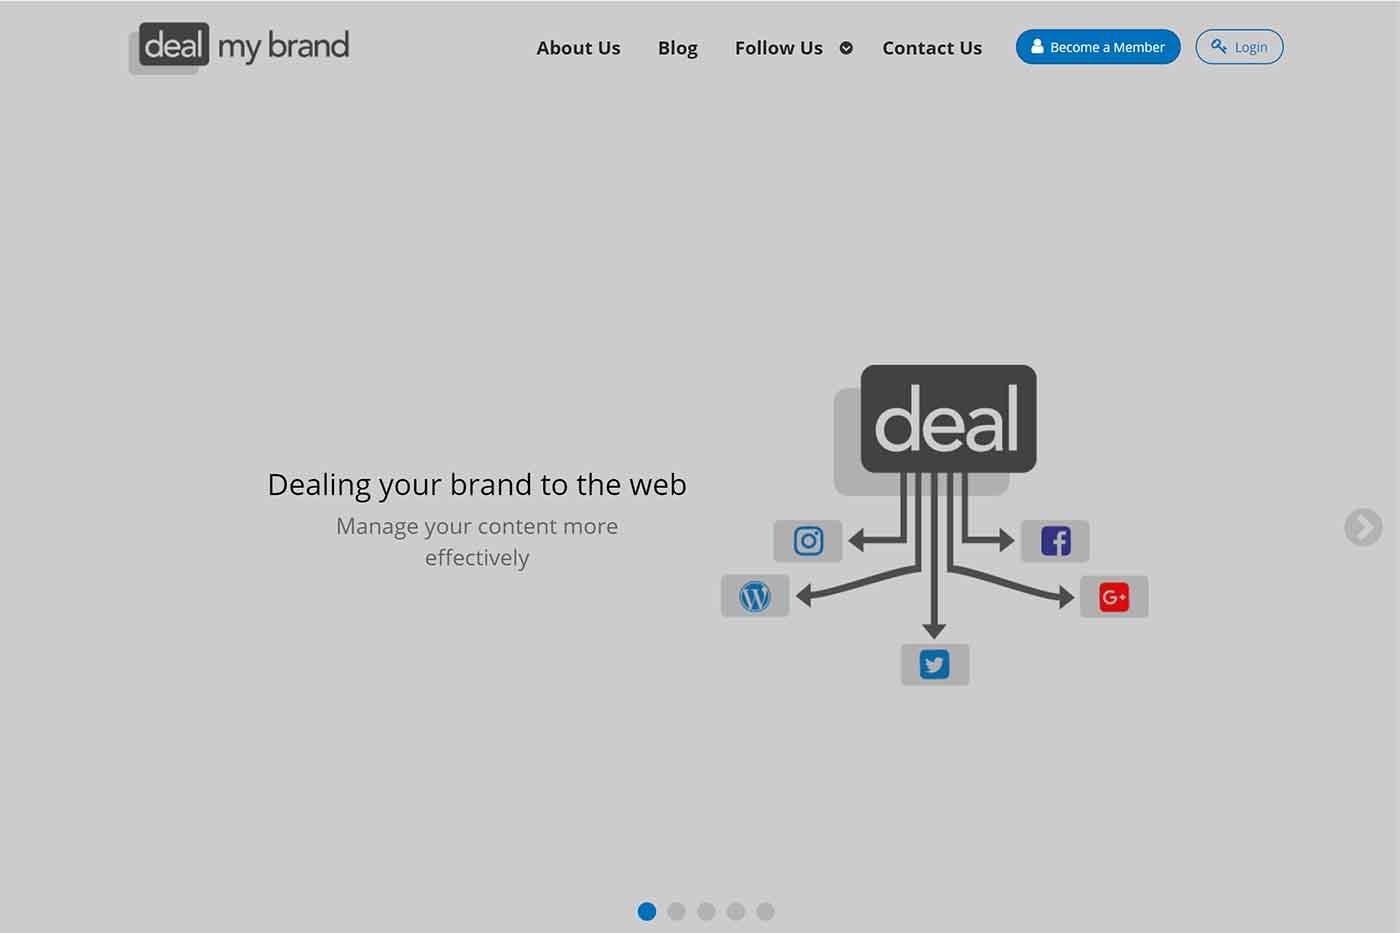 Deal My Brand